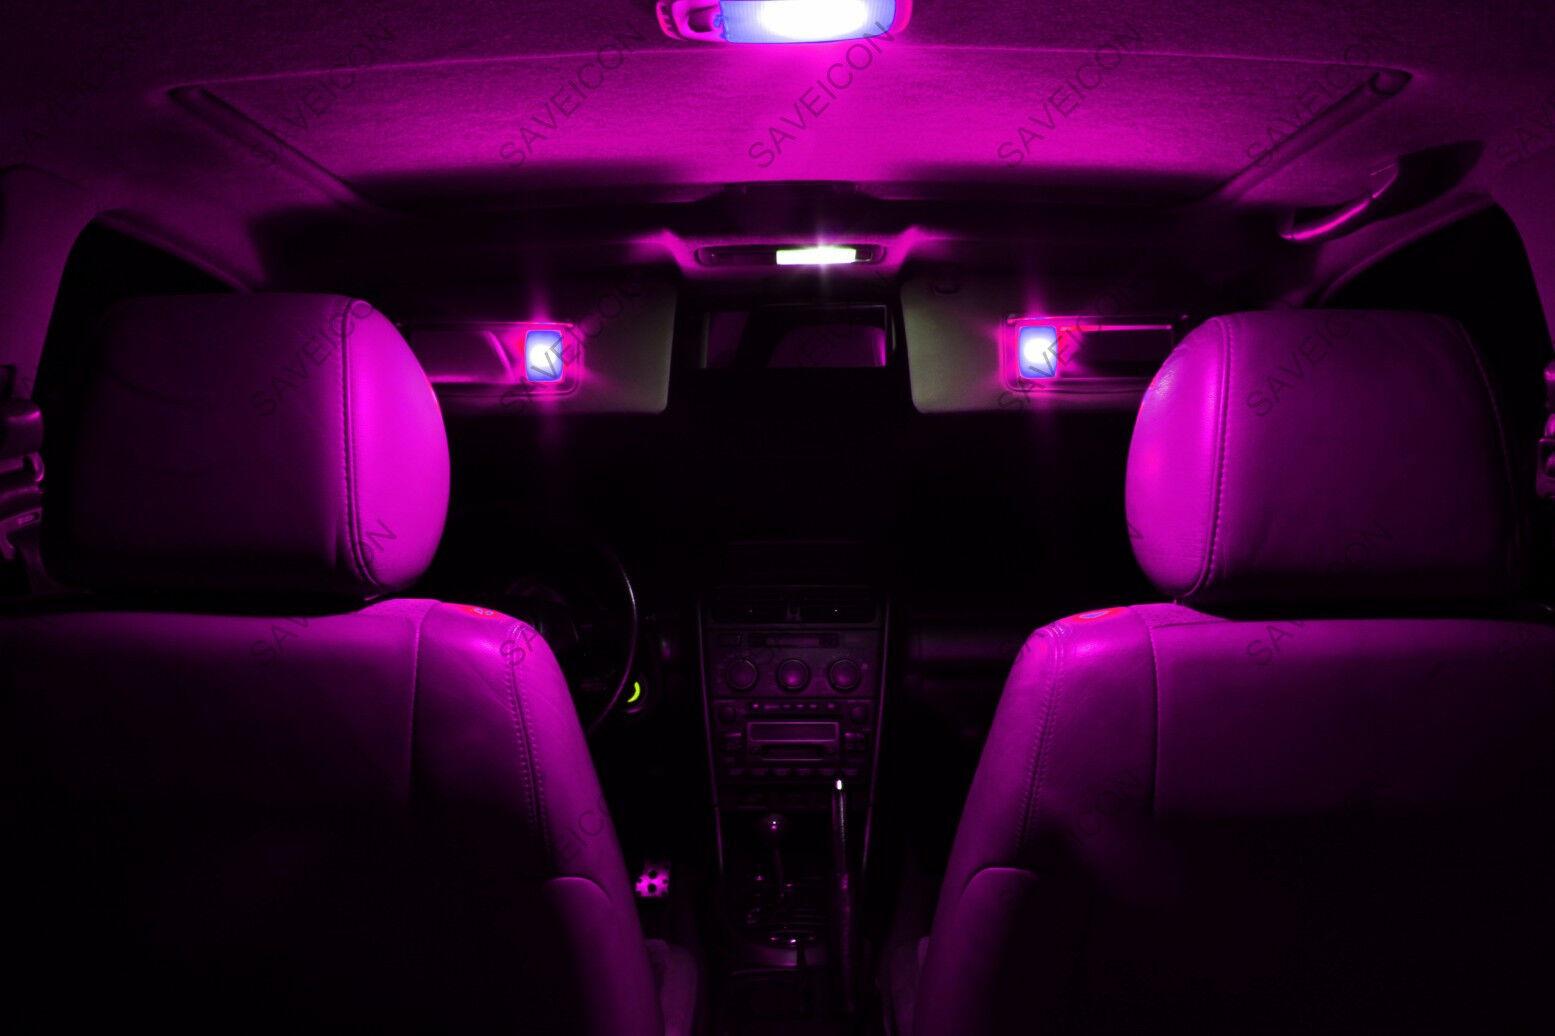 13 x pink purple led interior light package for 2012 2013 vw passat b7 picclick. Black Bedroom Furniture Sets. Home Design Ideas